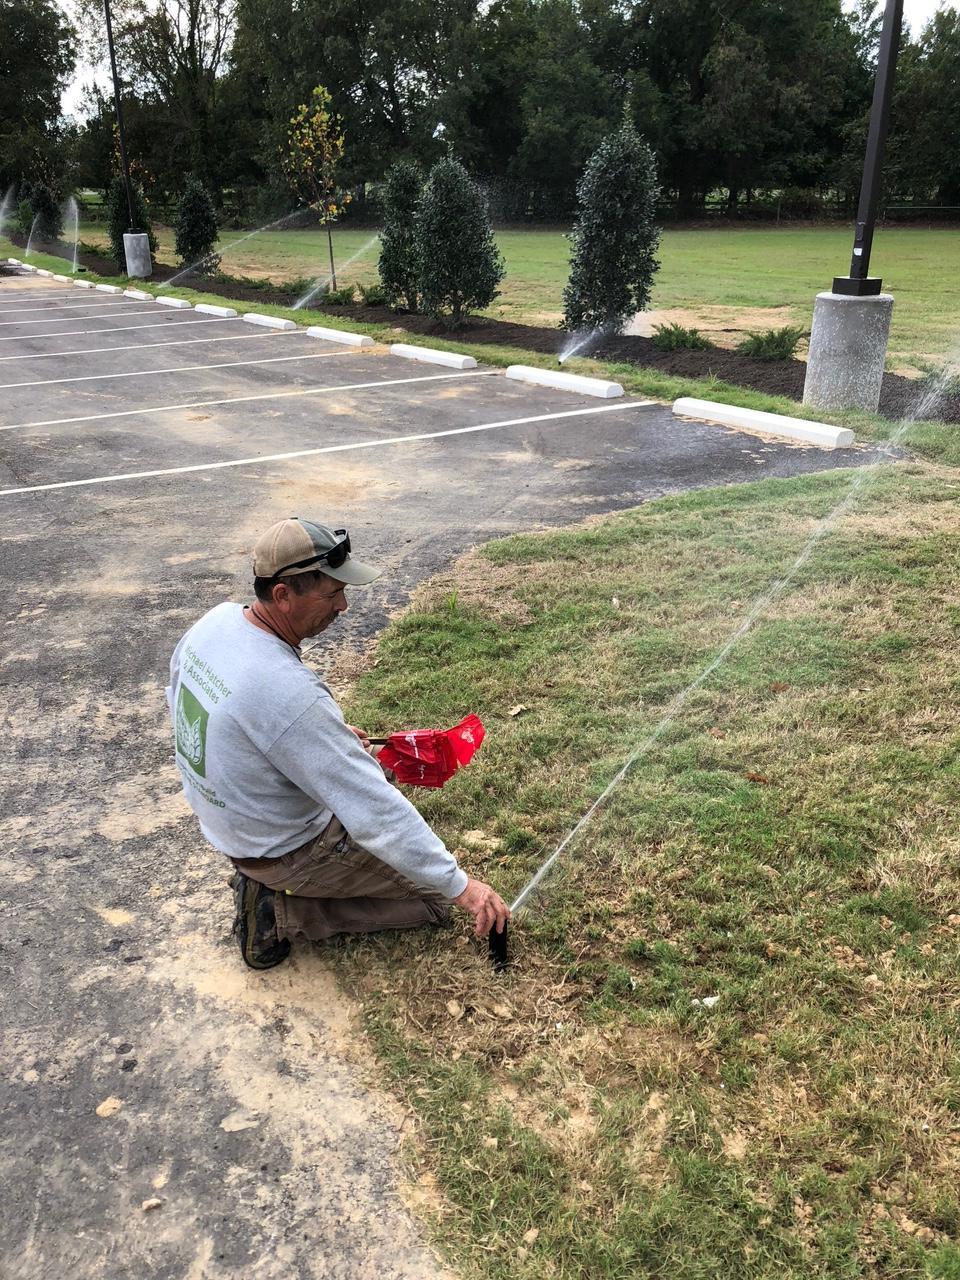 Tommy Neergaard adjusting an irrigation head